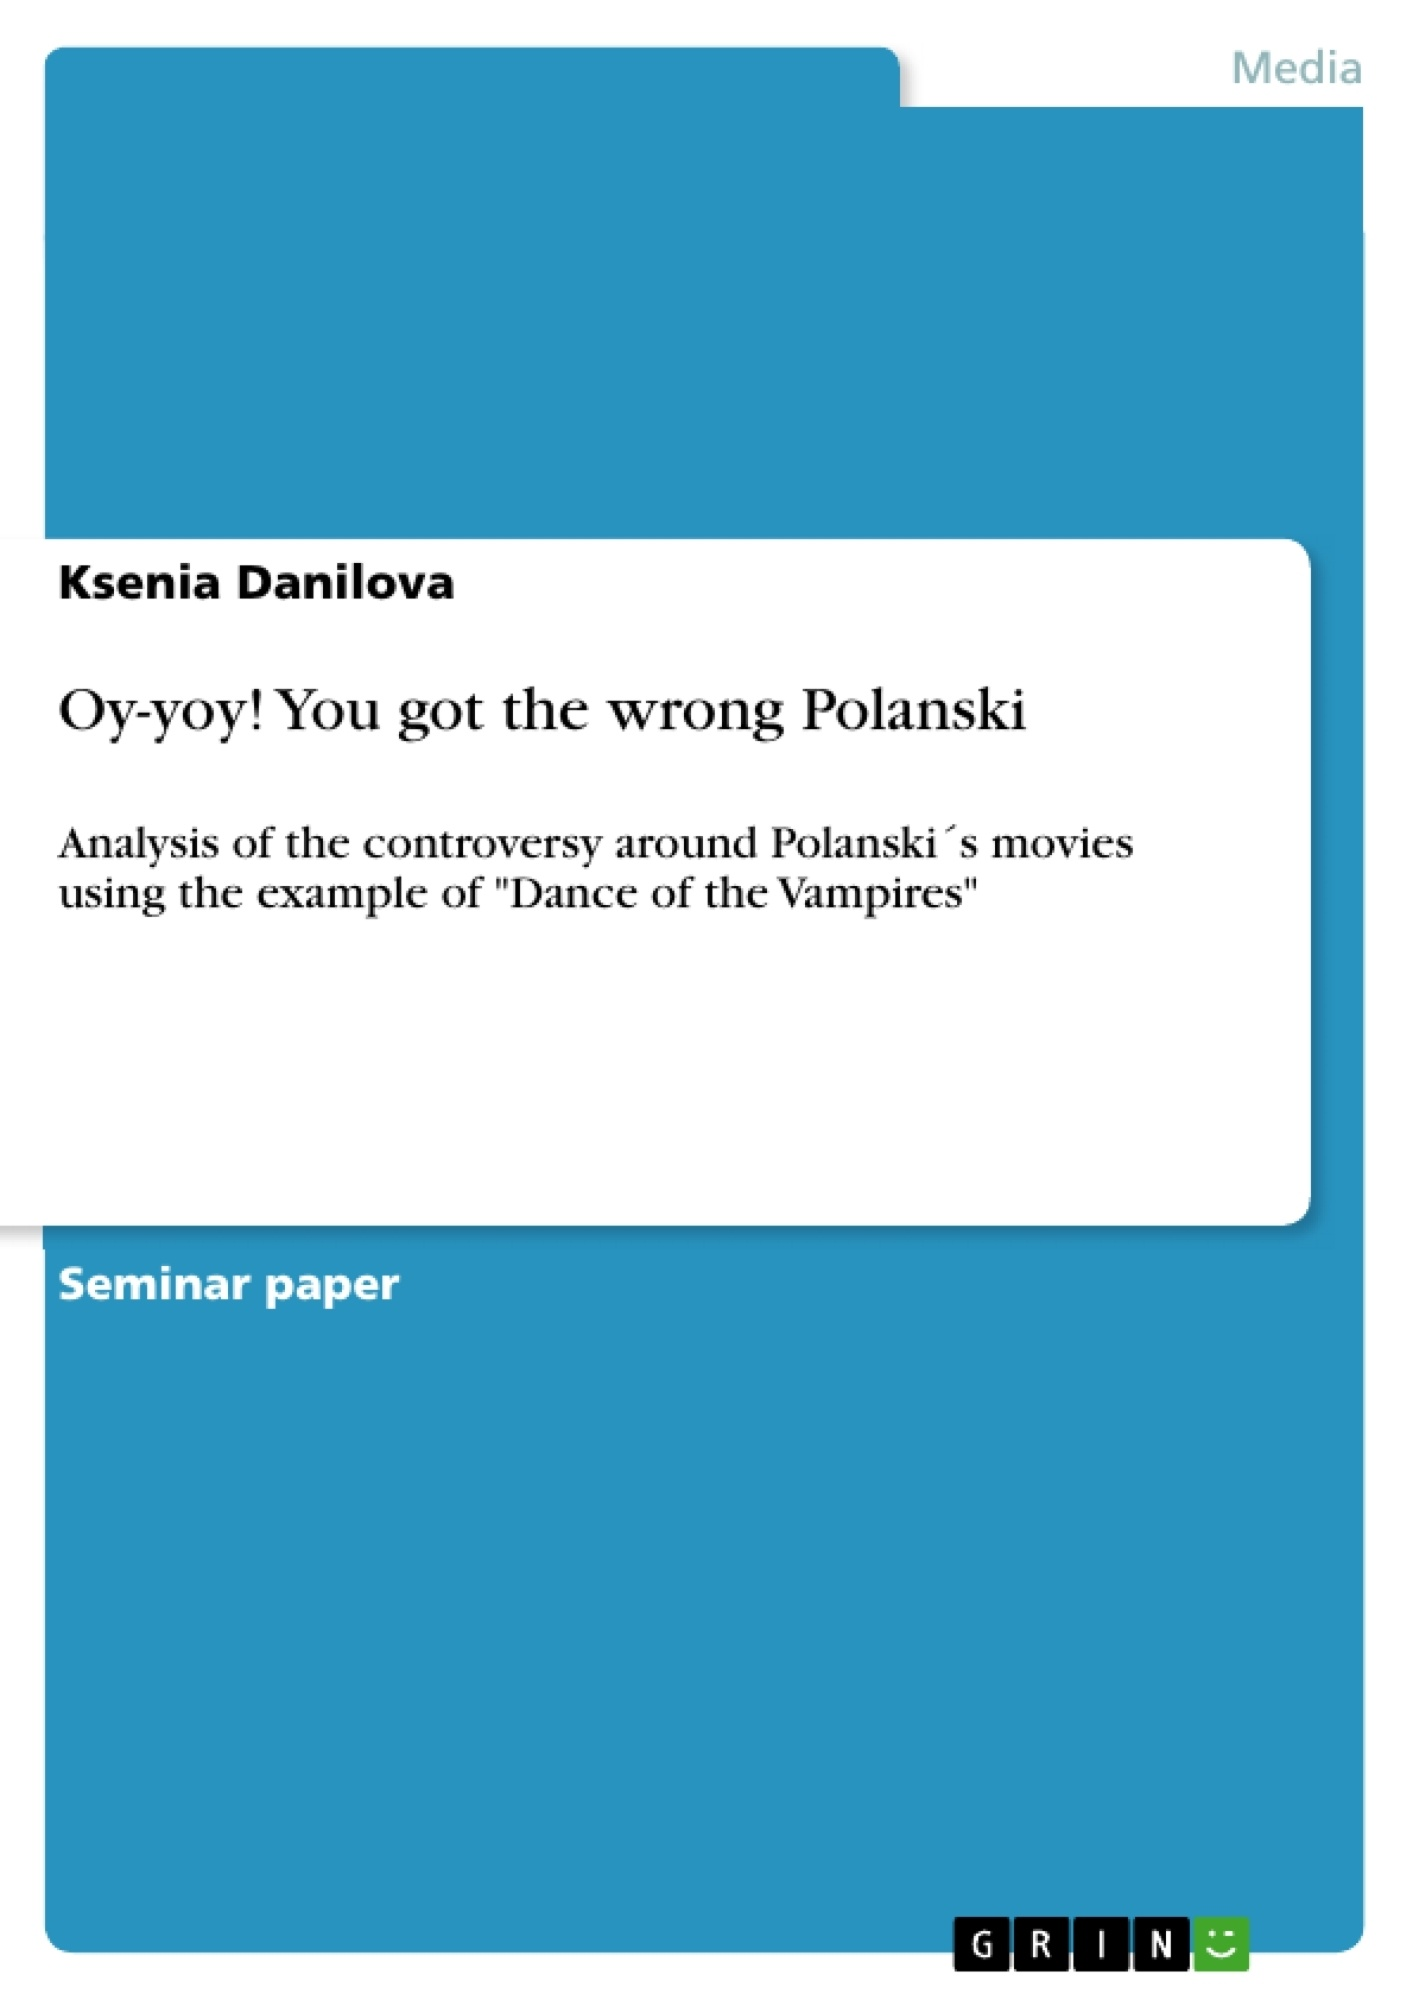 Title: Oy-yoy! You got the wrong Polanski